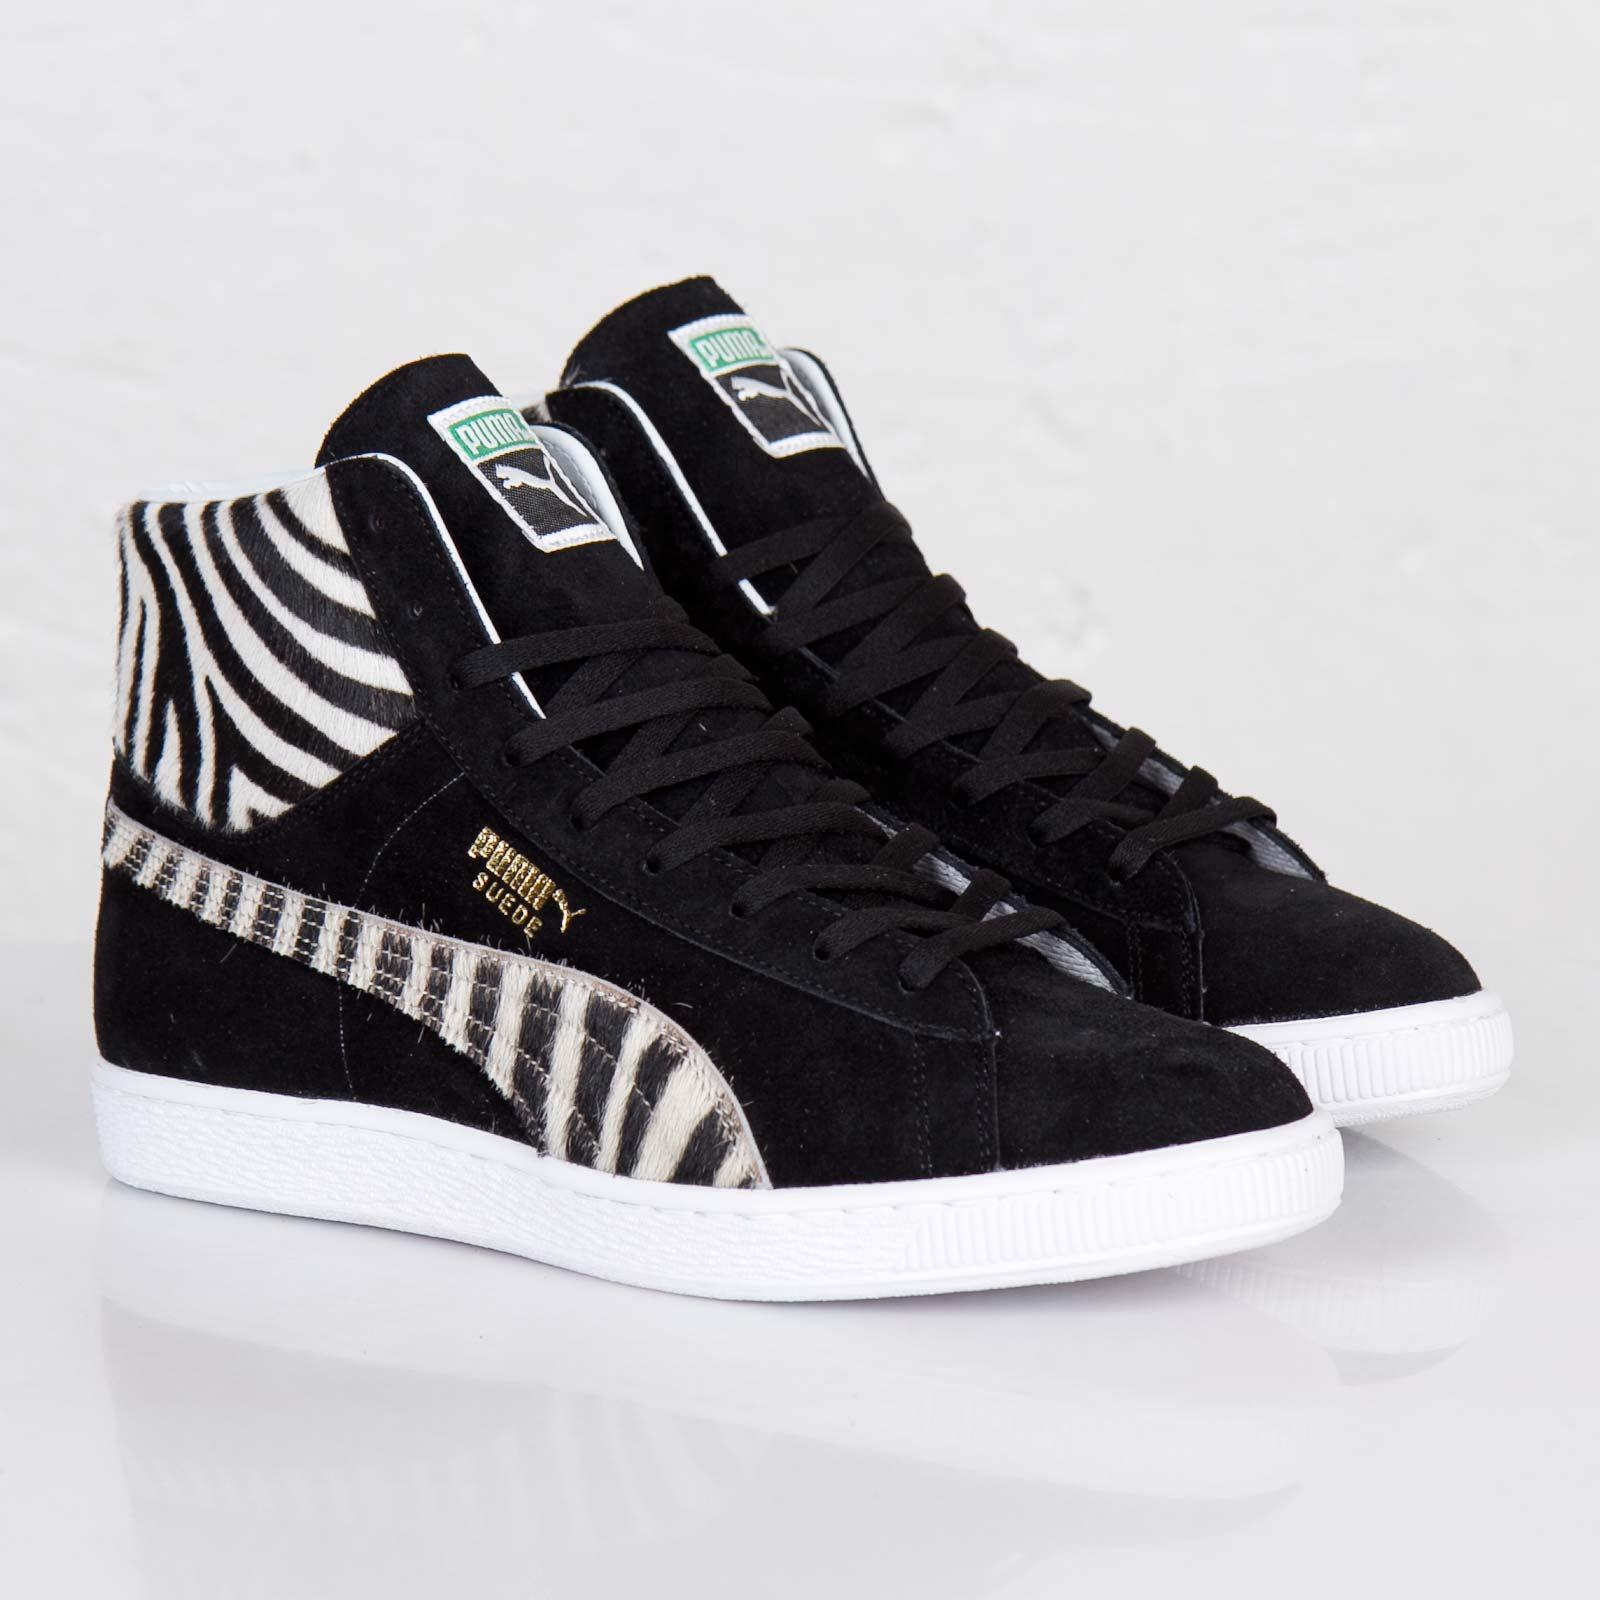 Puma Japan Suede Mid Zebra - 356585-01 - Sneakersnstuff  a00334890